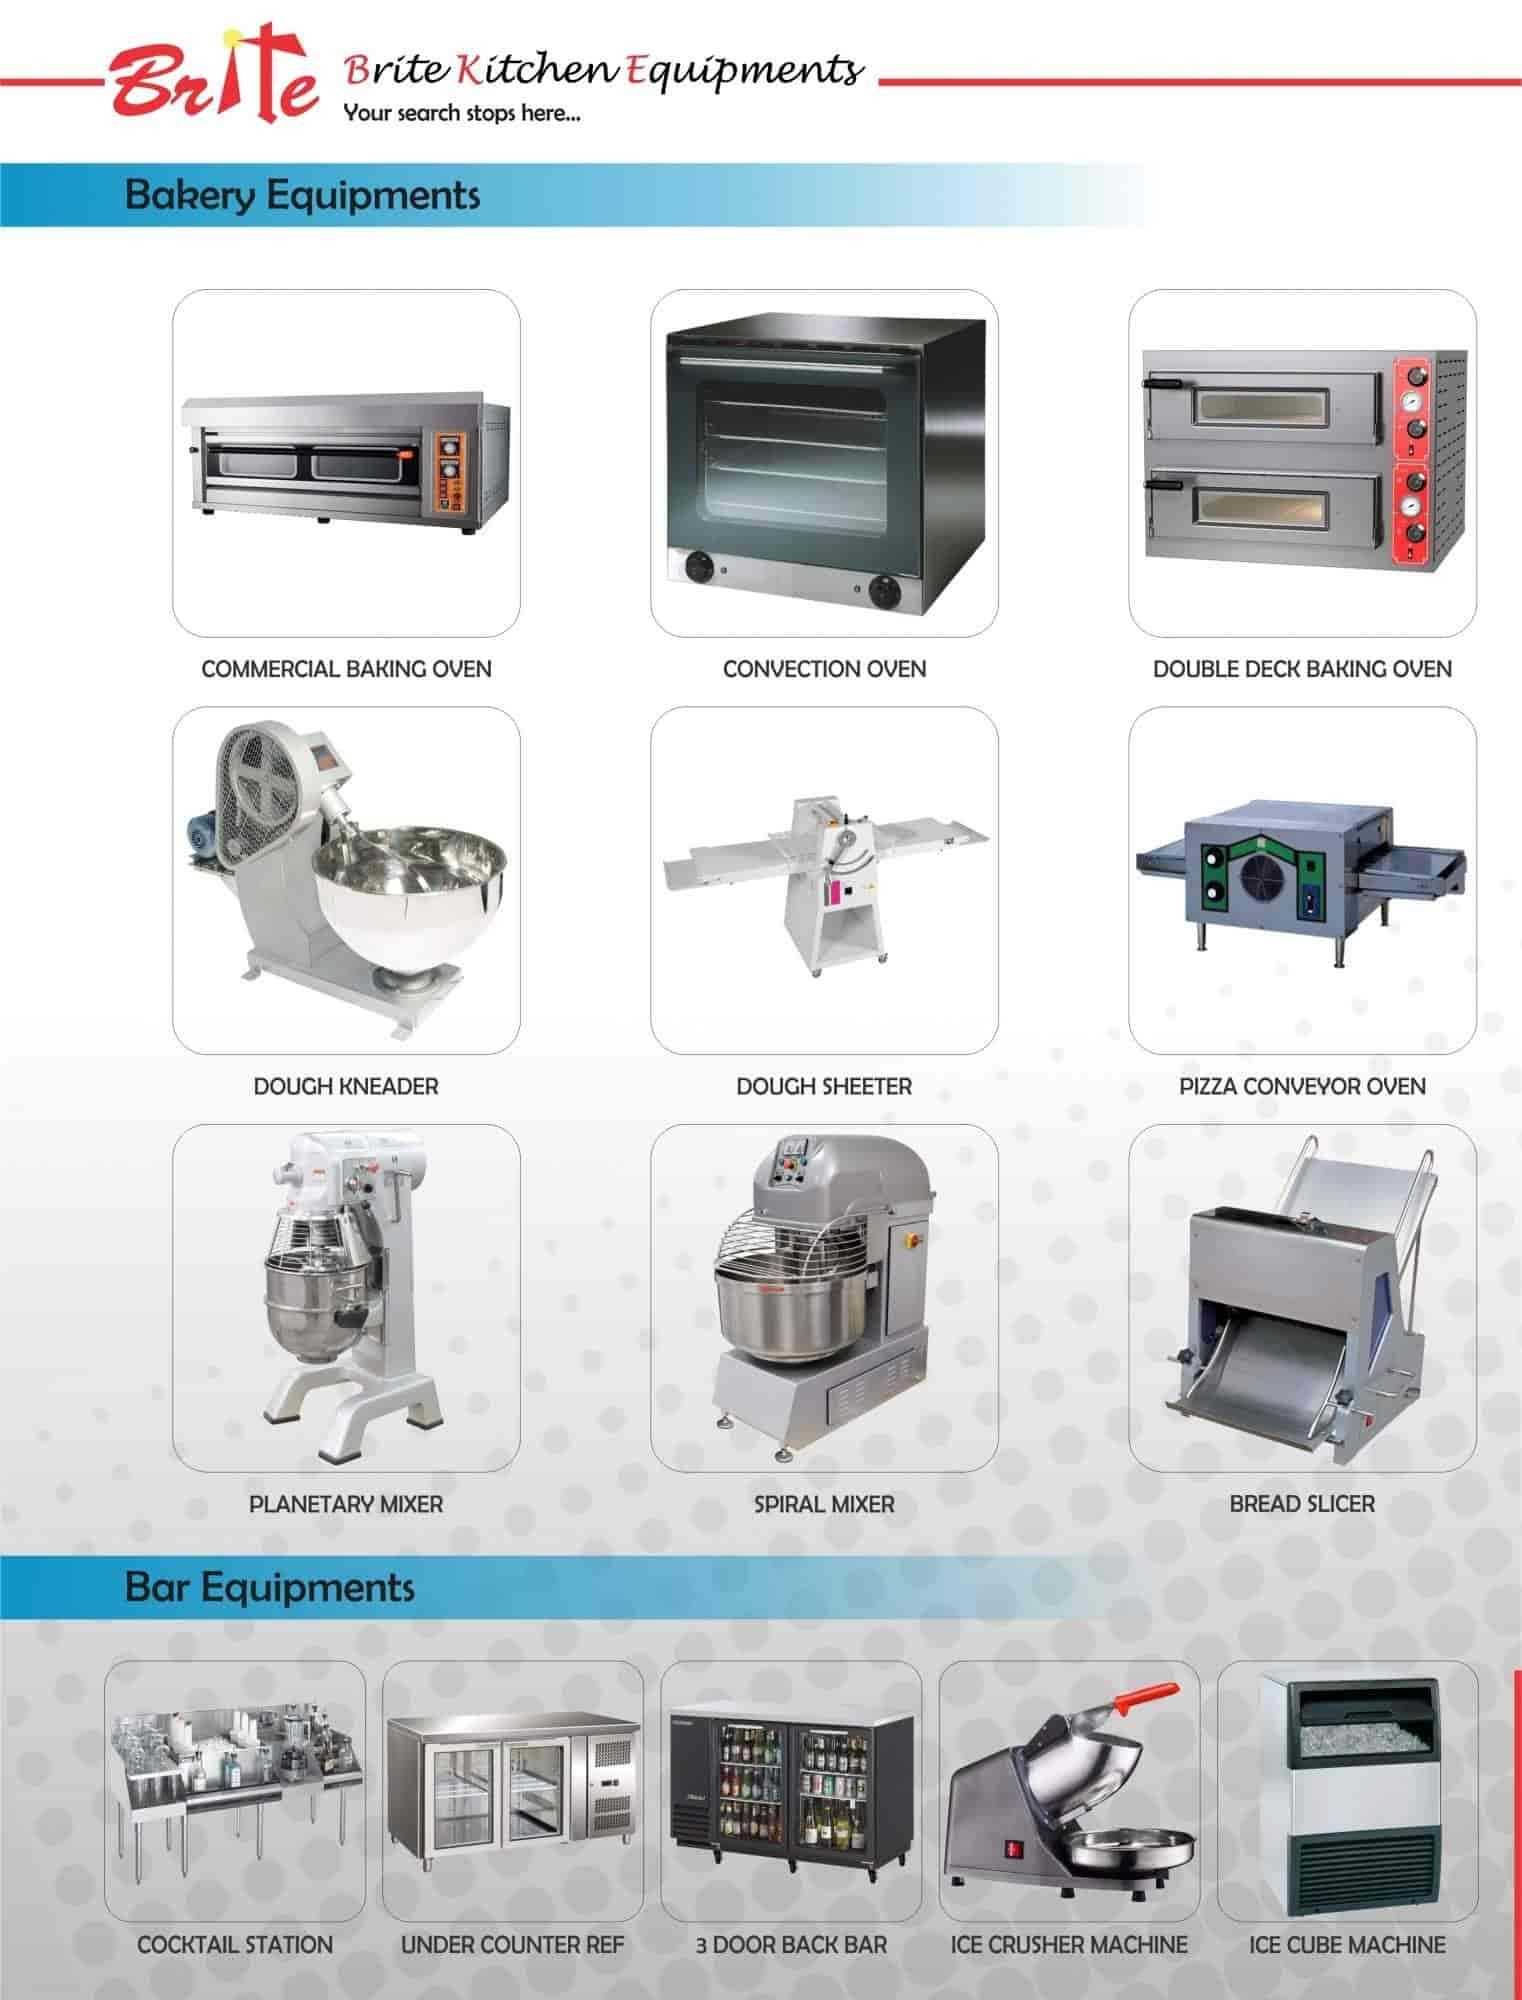 Brite kitchen equipments photos lake gardens kolkata commercial kitchen equipment manufacturers